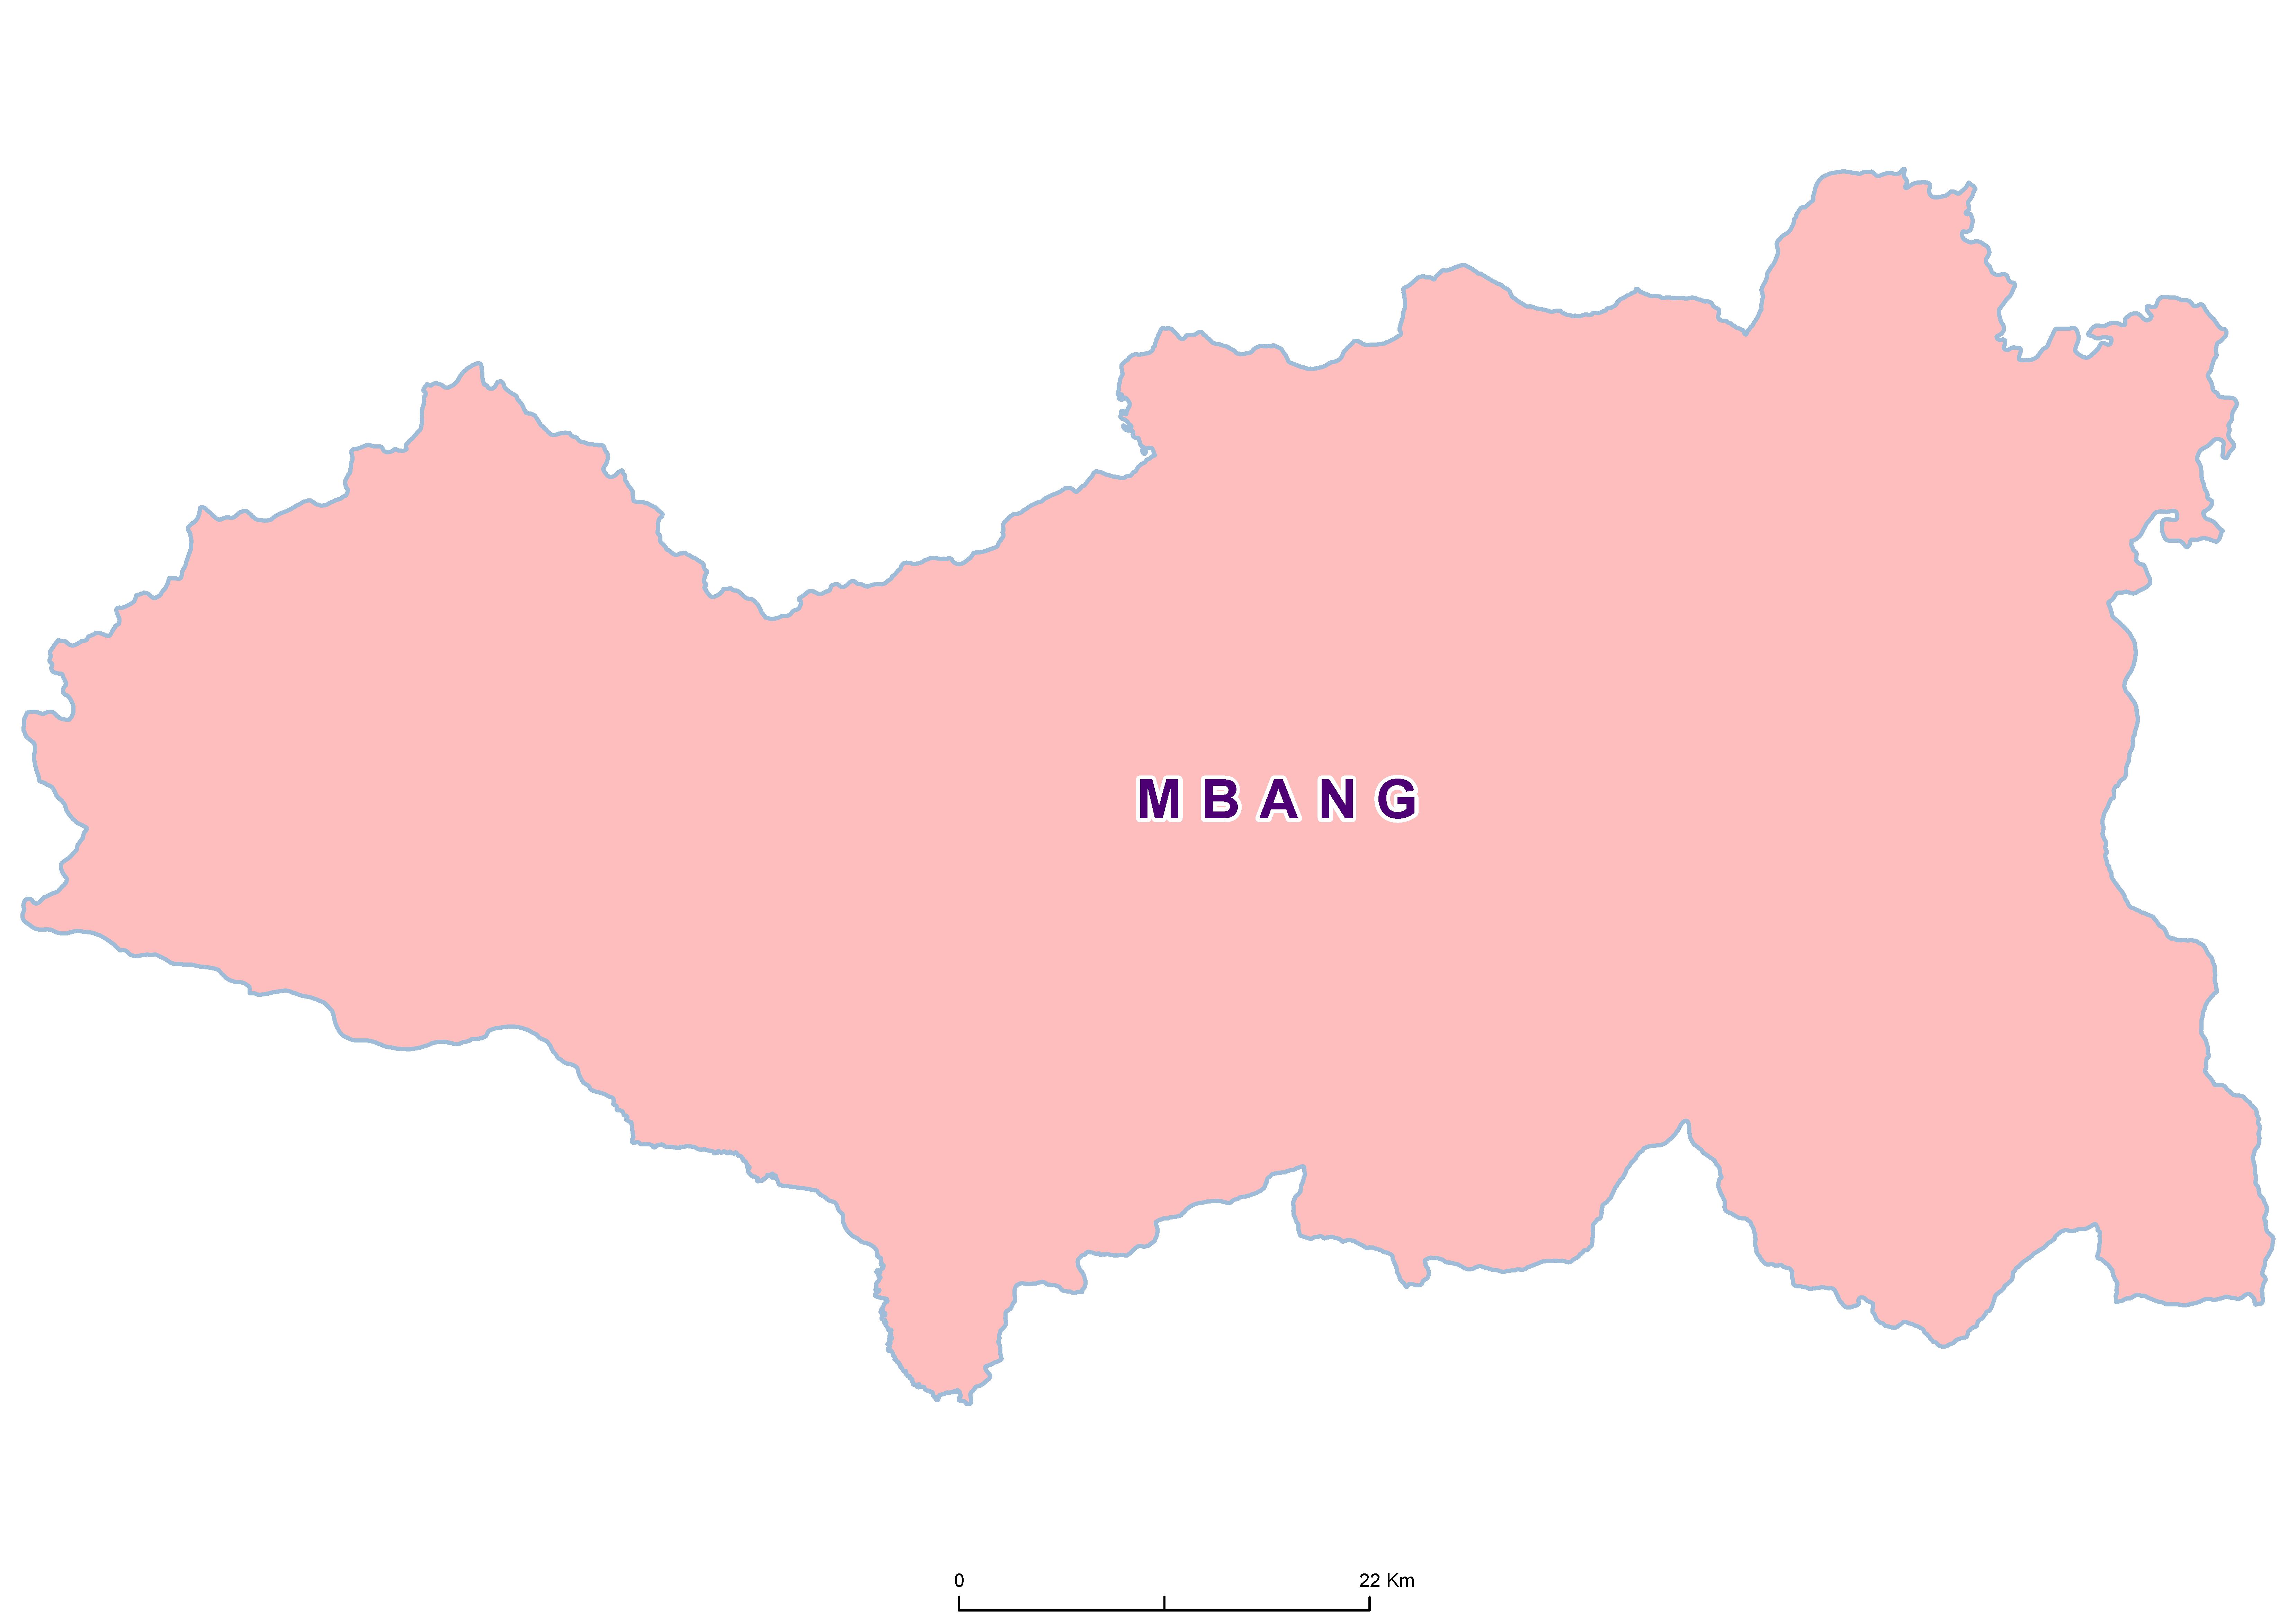 Mbang Mean SCH 19850001